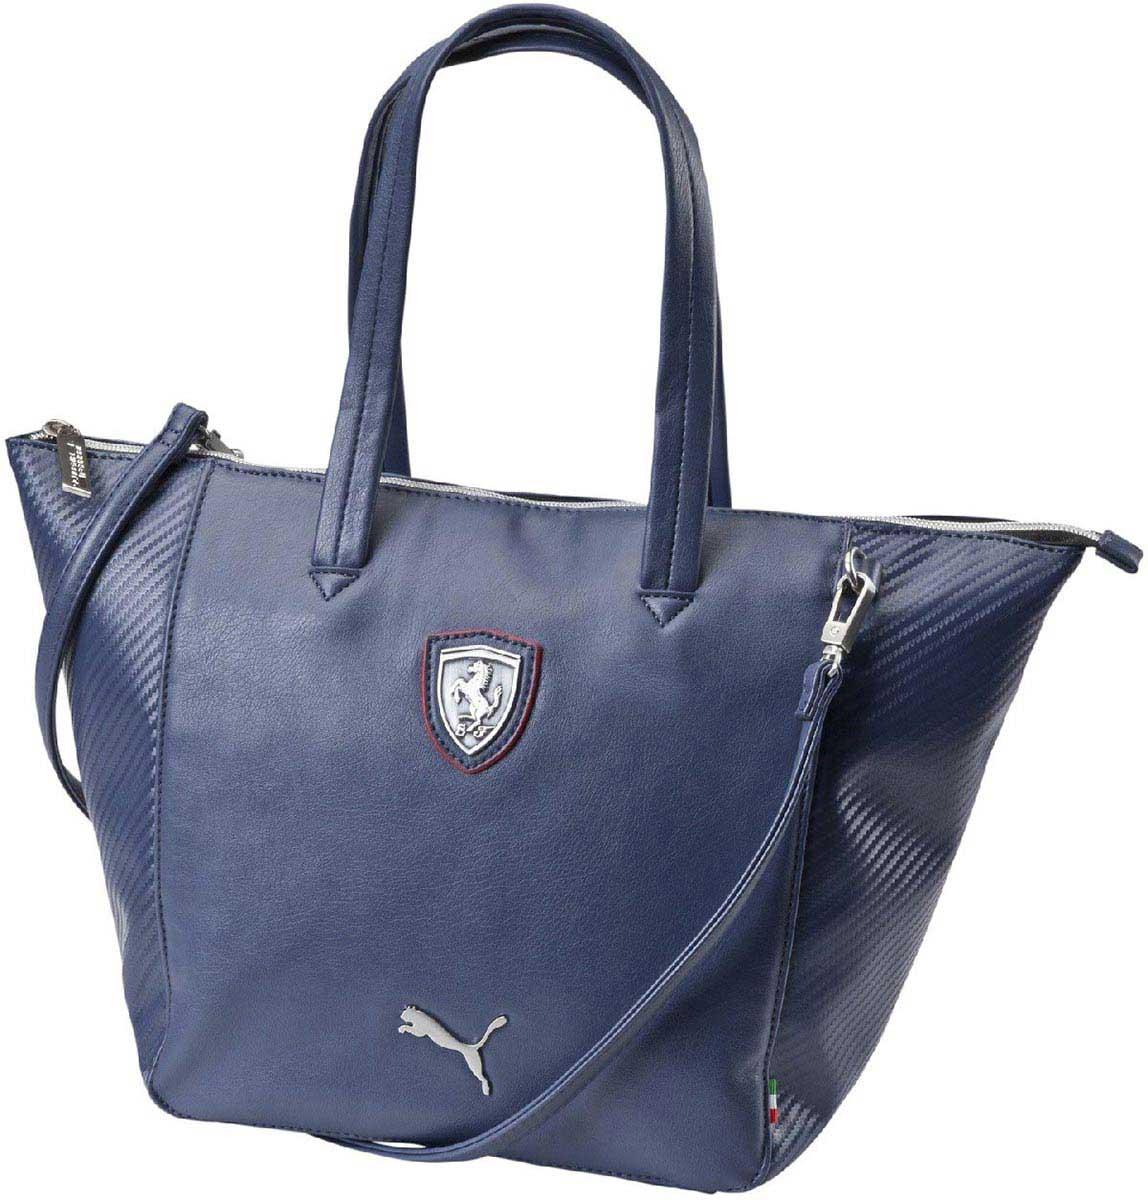 Puma Ferrari Ls Handbag Sportisimo. Picture 2 Of 4. Puma Scuderia Ferrari  Ls Women Red Handbag Small Satchel 074845 Ebay d26fac96b0bb9